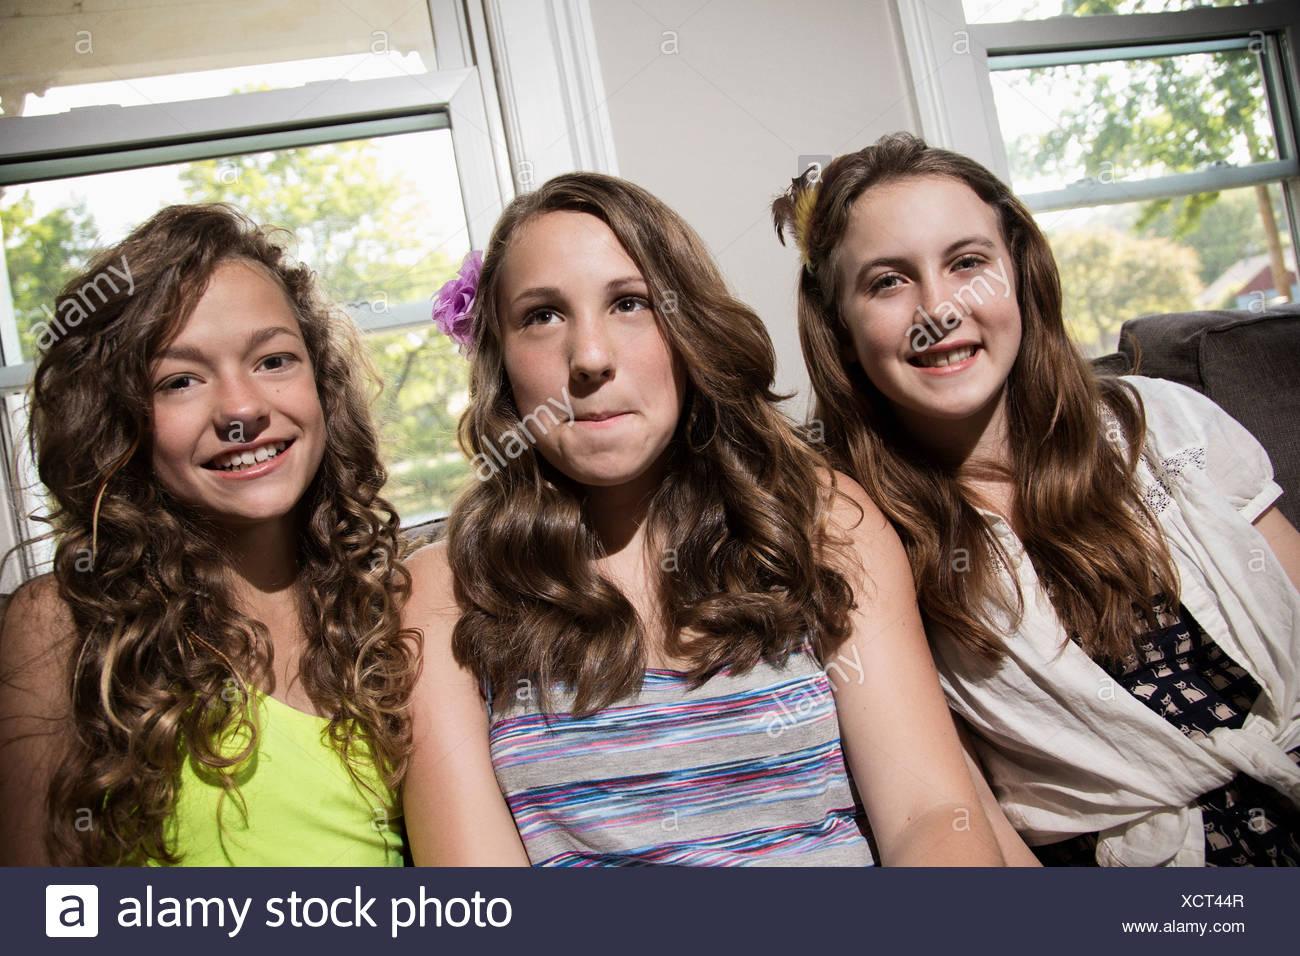 Three Girls On Camera